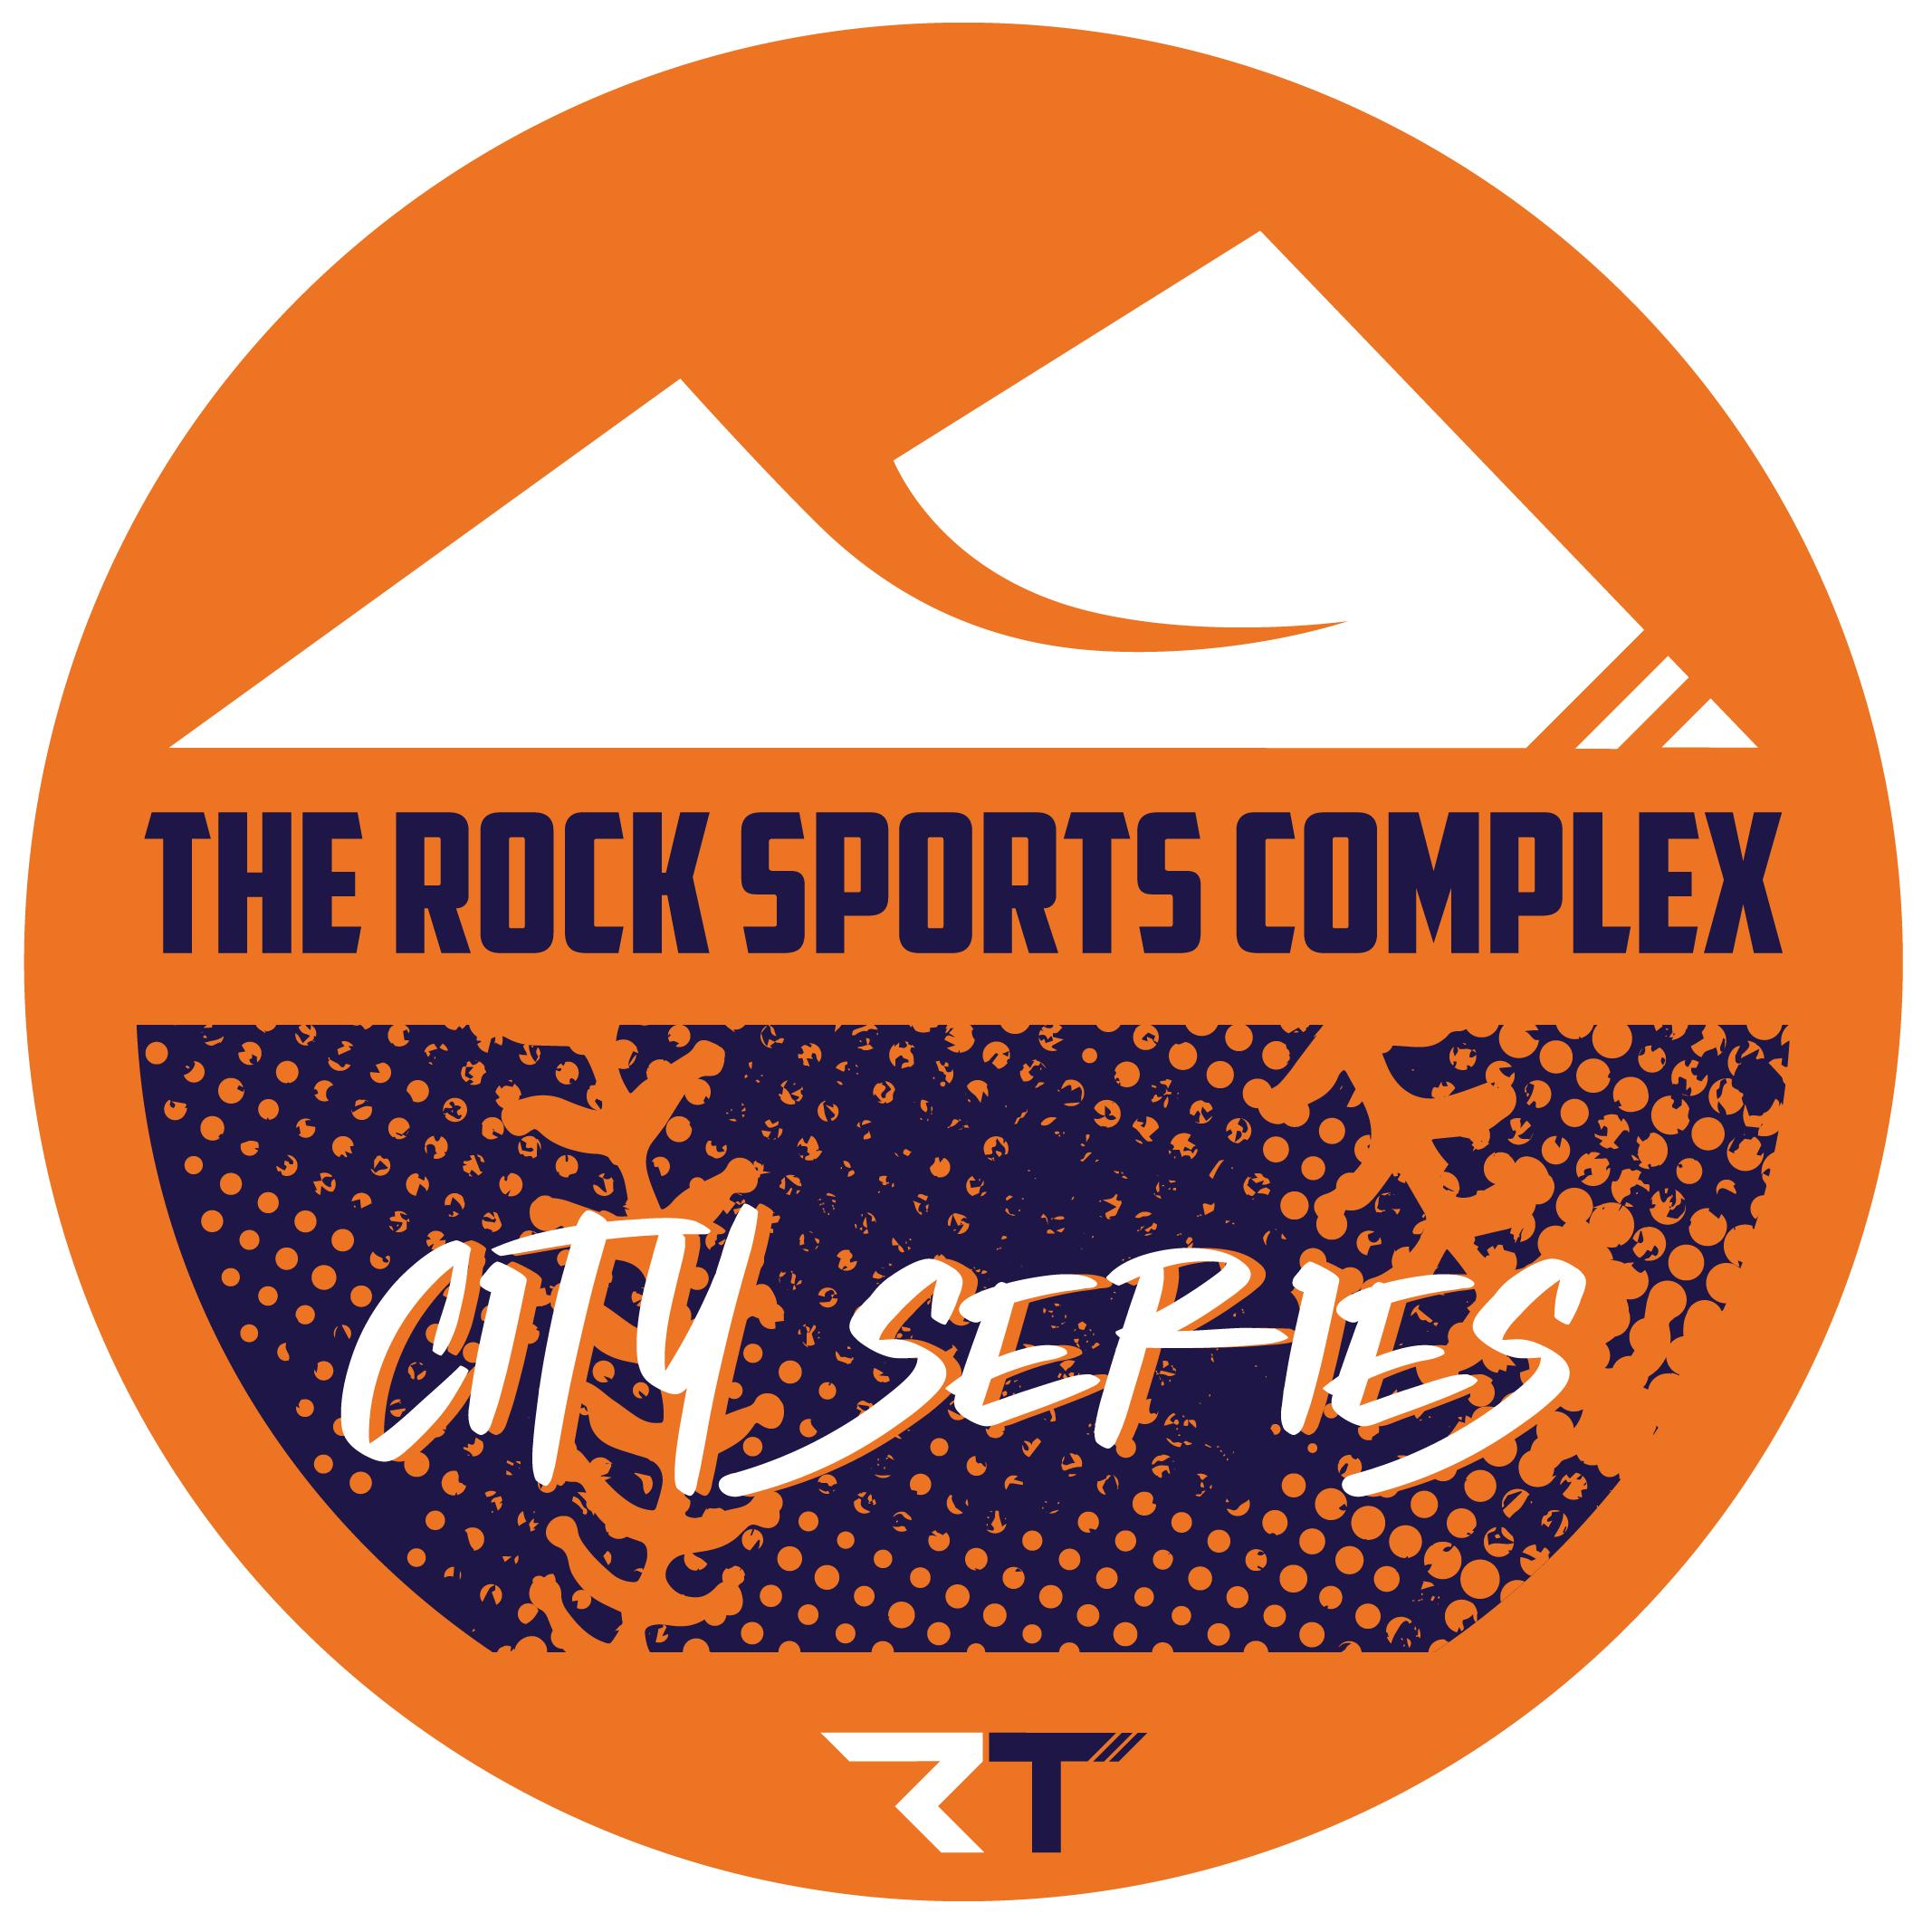 City Series - Rock